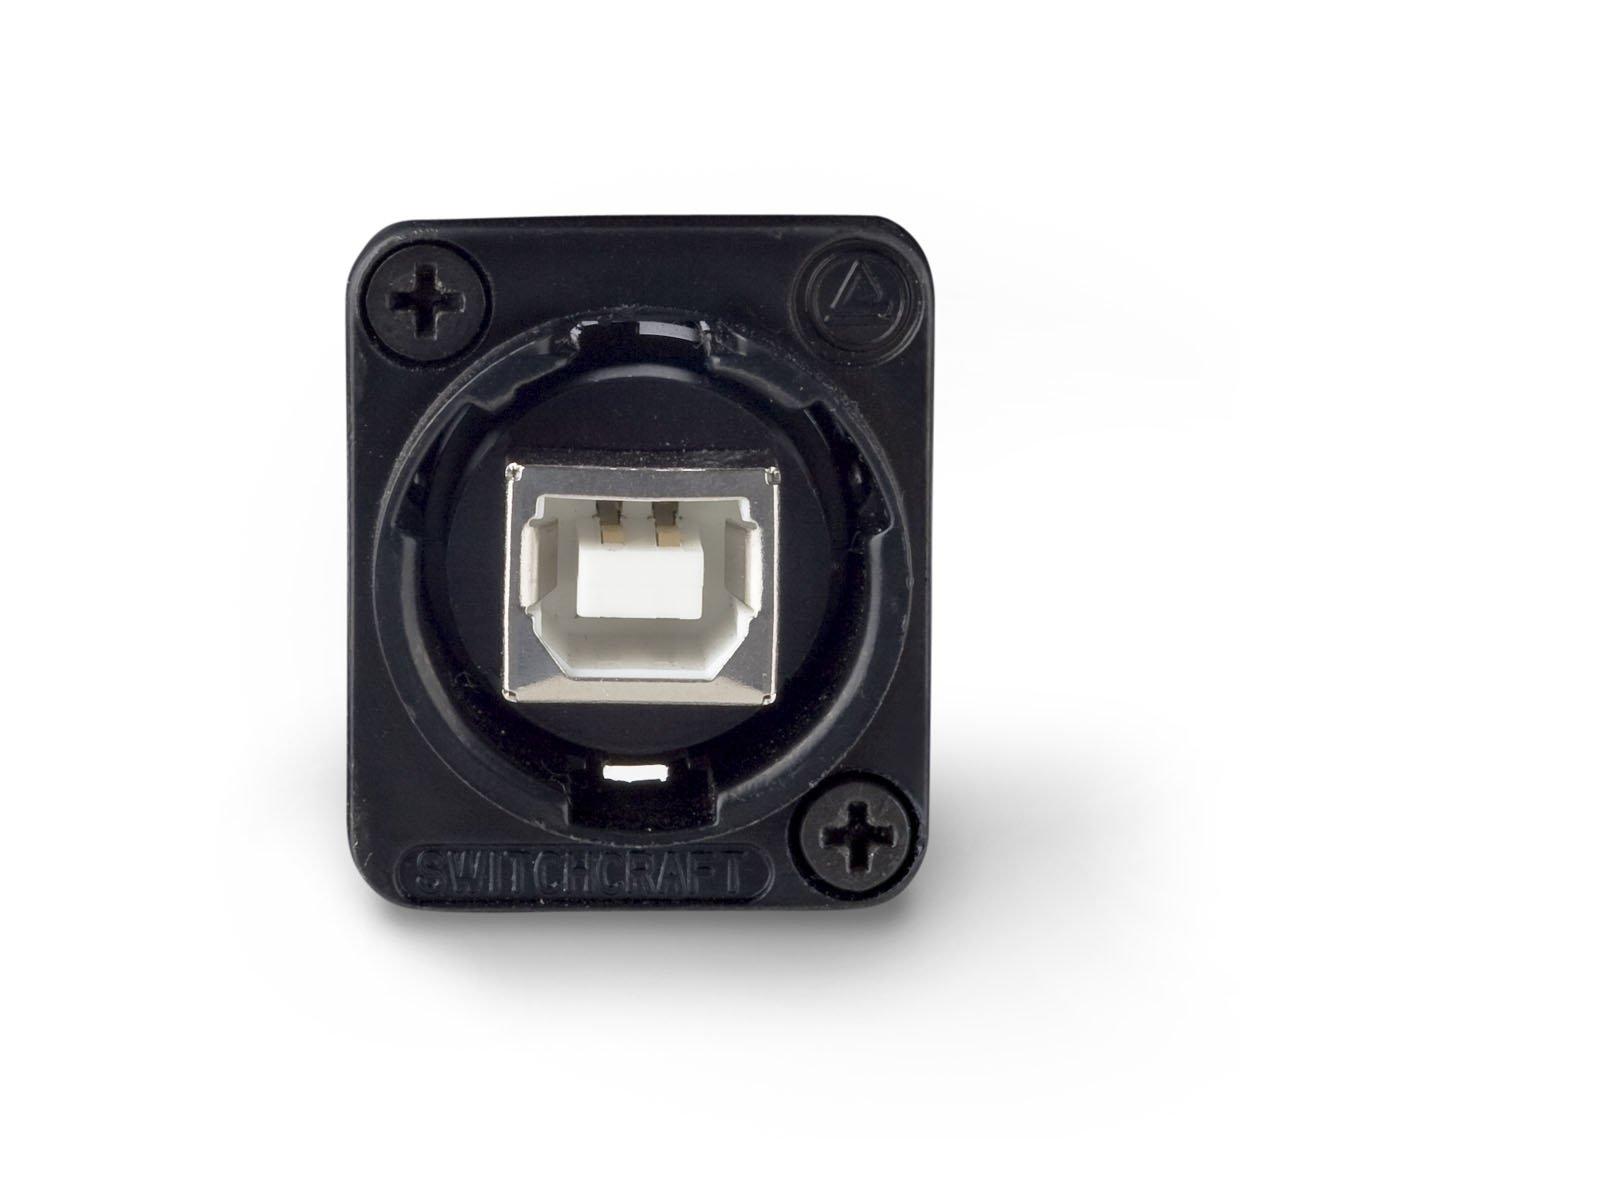 Switchcraft EHUSBBABX USB-B to USB-A Feedthru Panel Mount Jack, Black Finish by Switchcraft